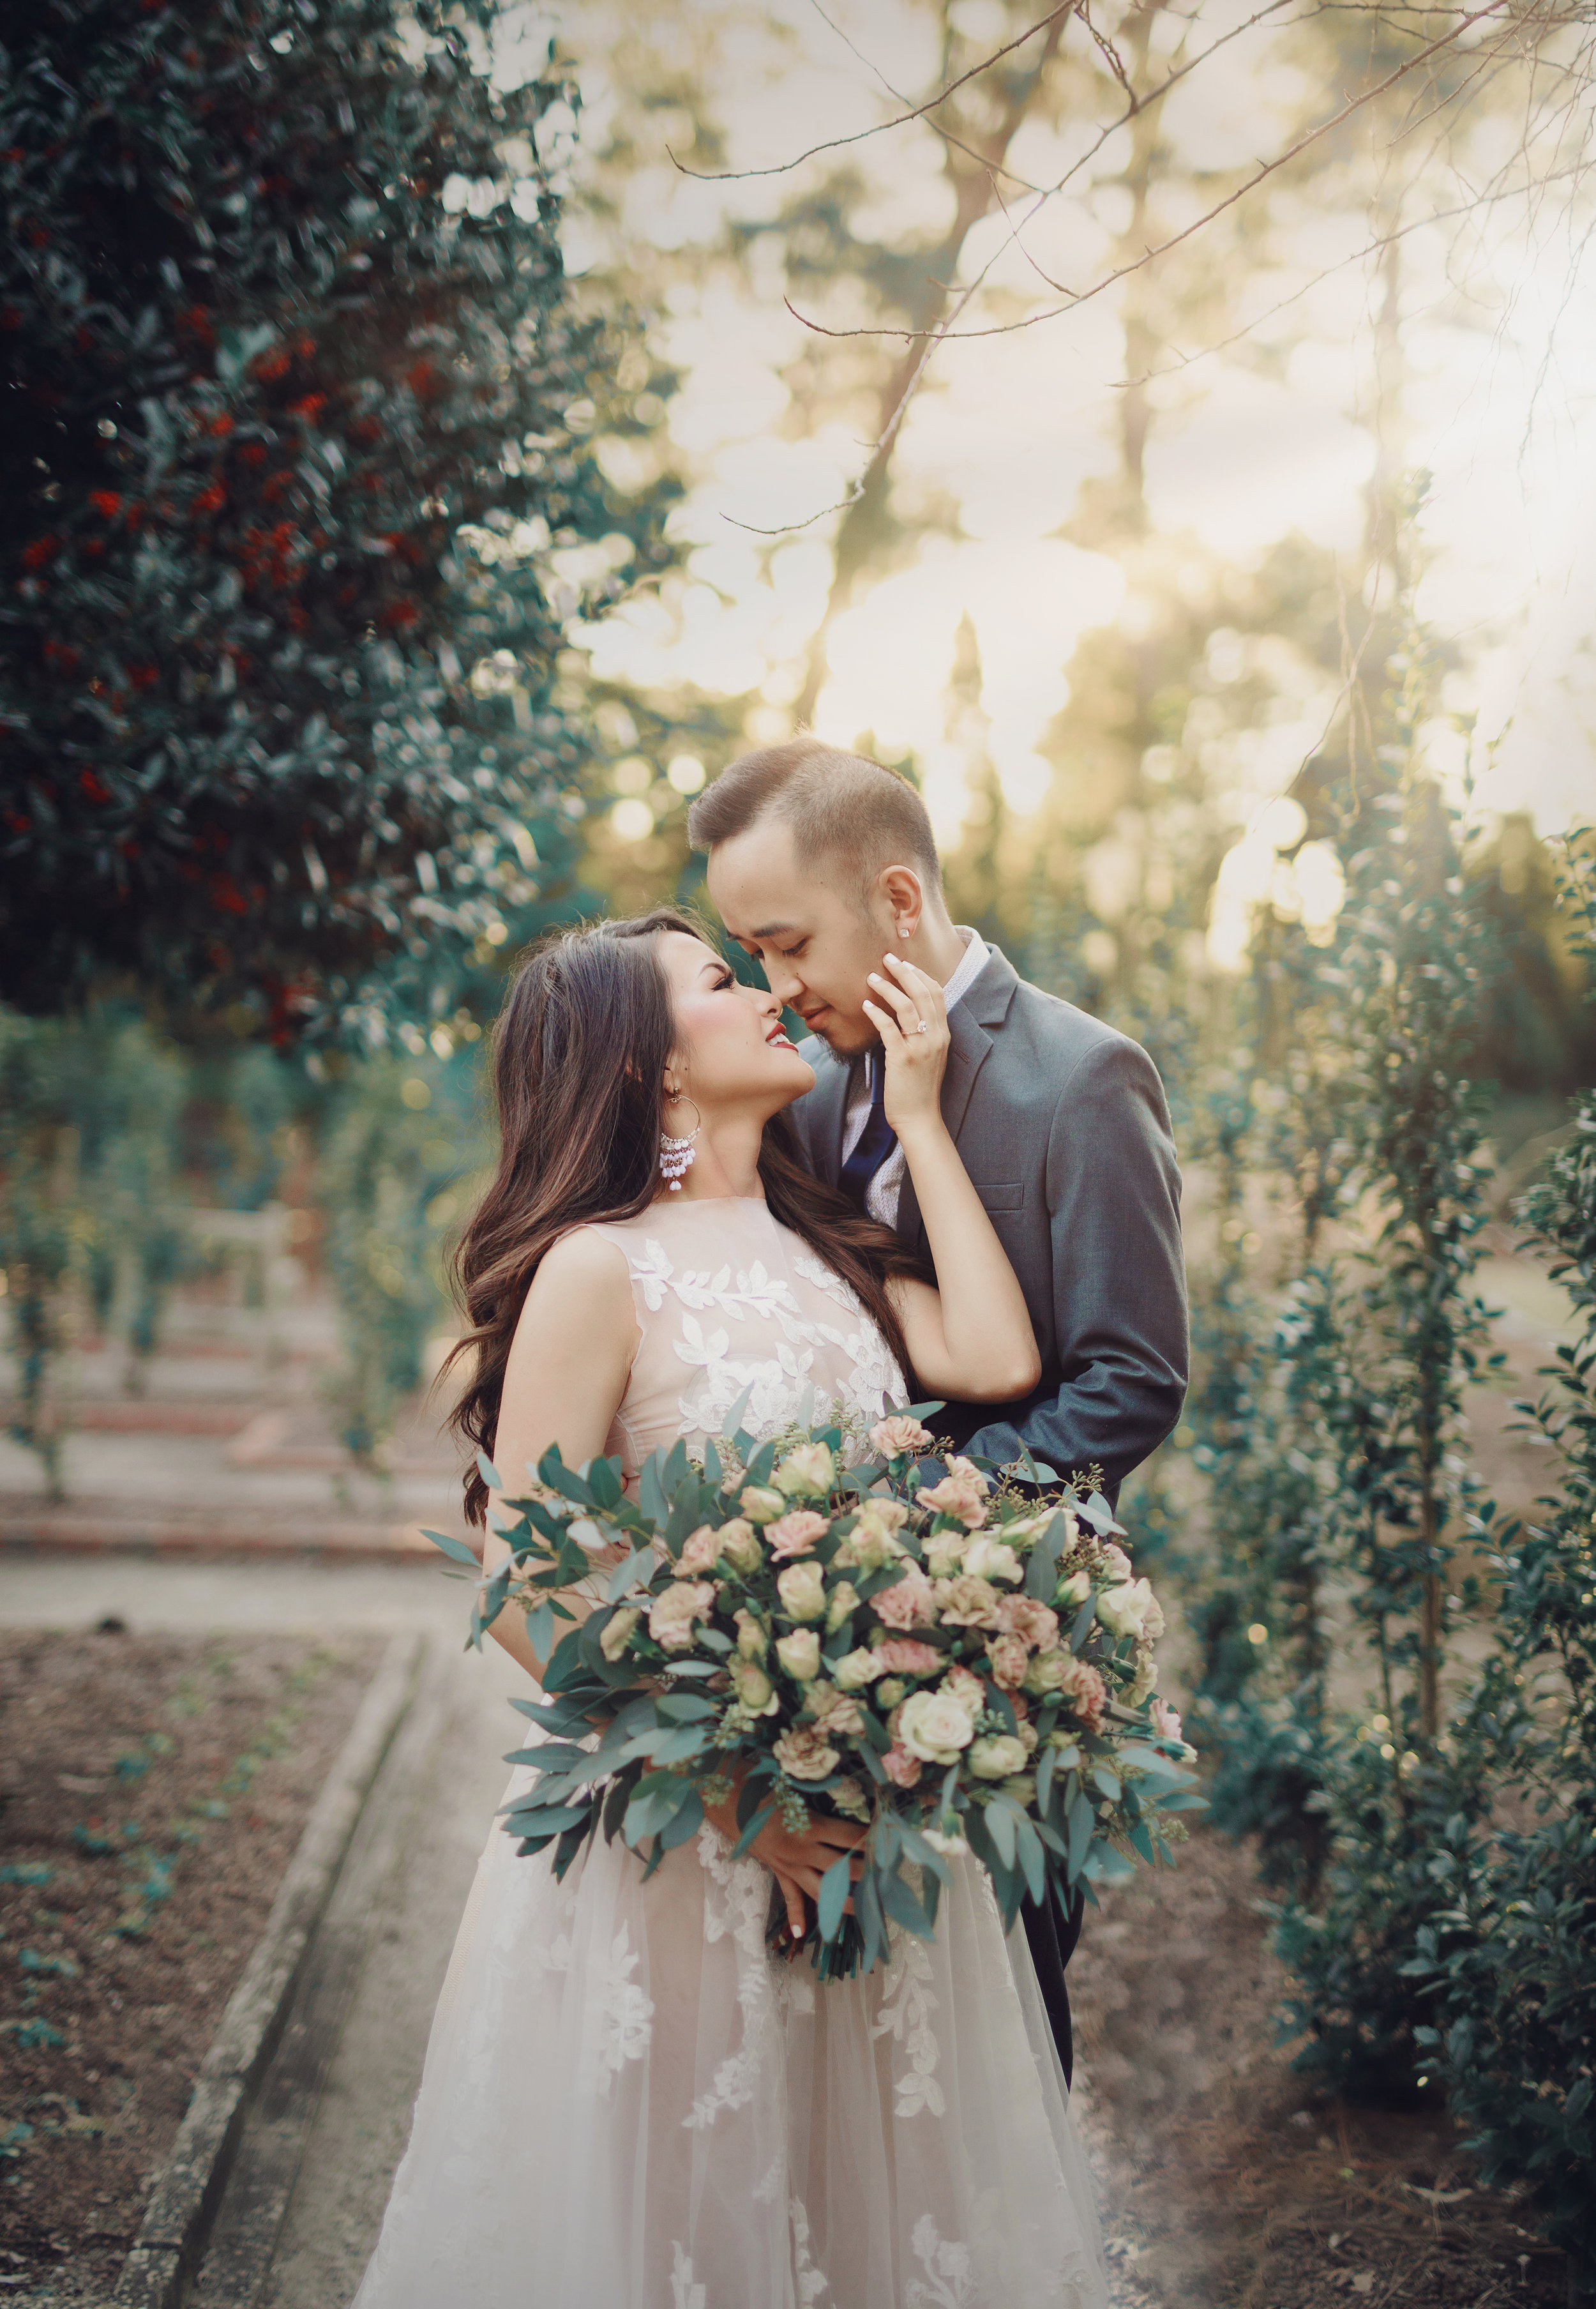 Lisa wedding-9copy.jpg